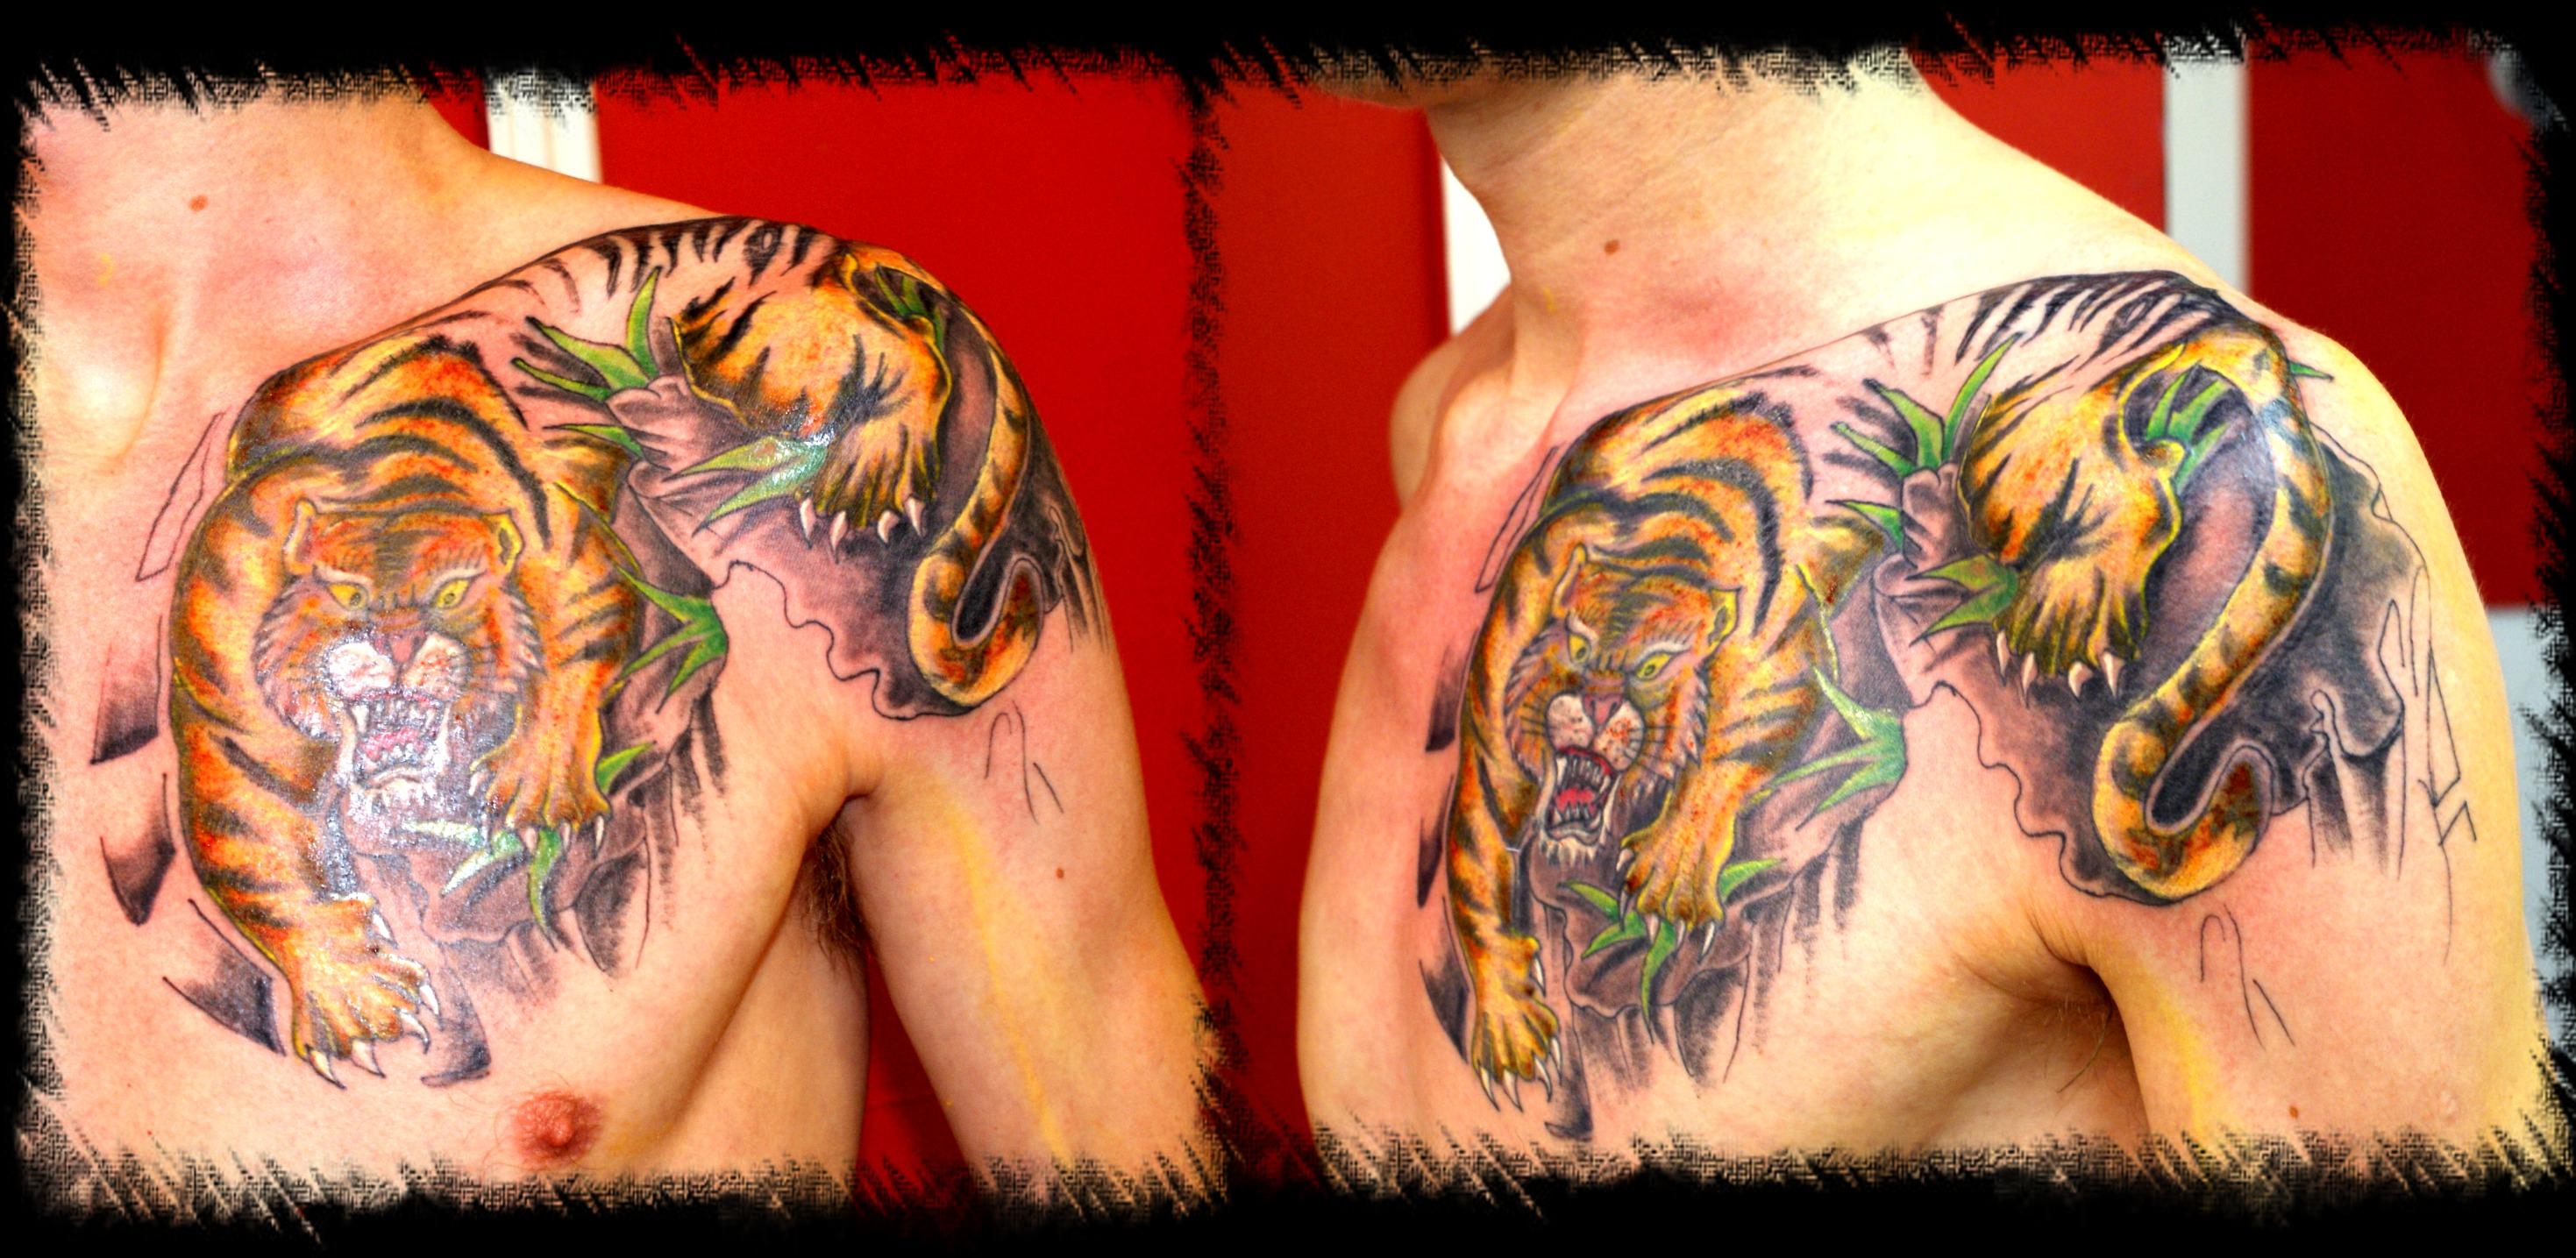 ed1e8c6e775c4 Tiger Japanese Tattoo Picture